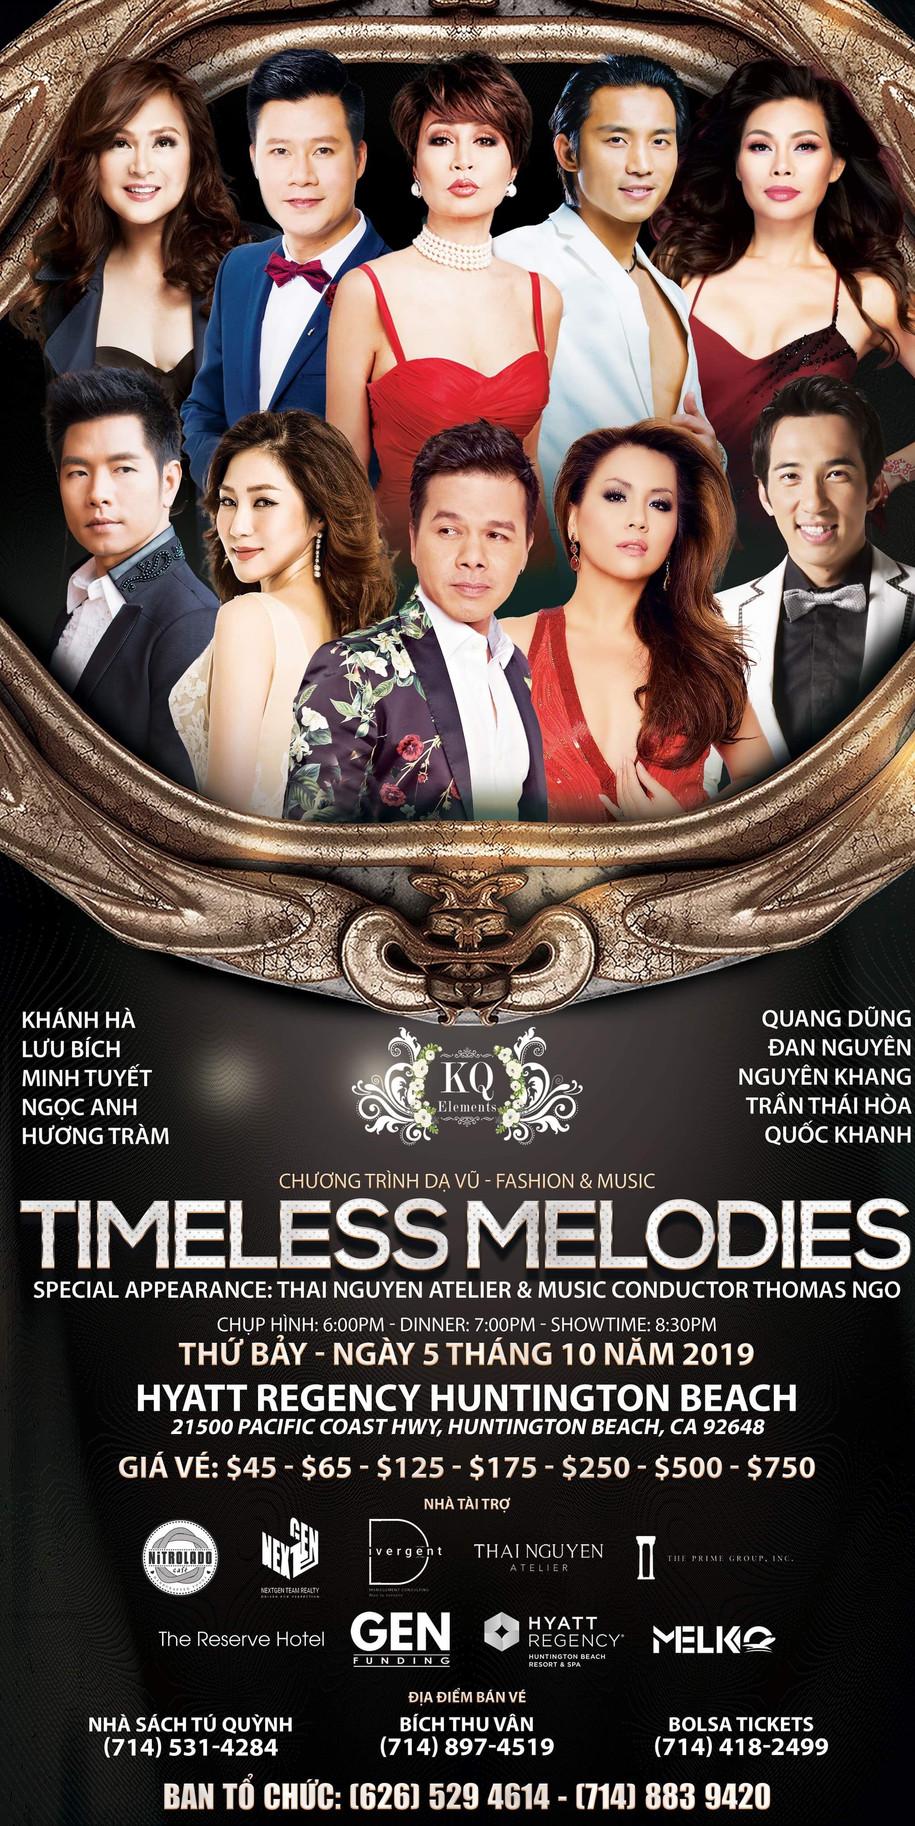 Timeless Melodies Concert 10-05-2019.jpg